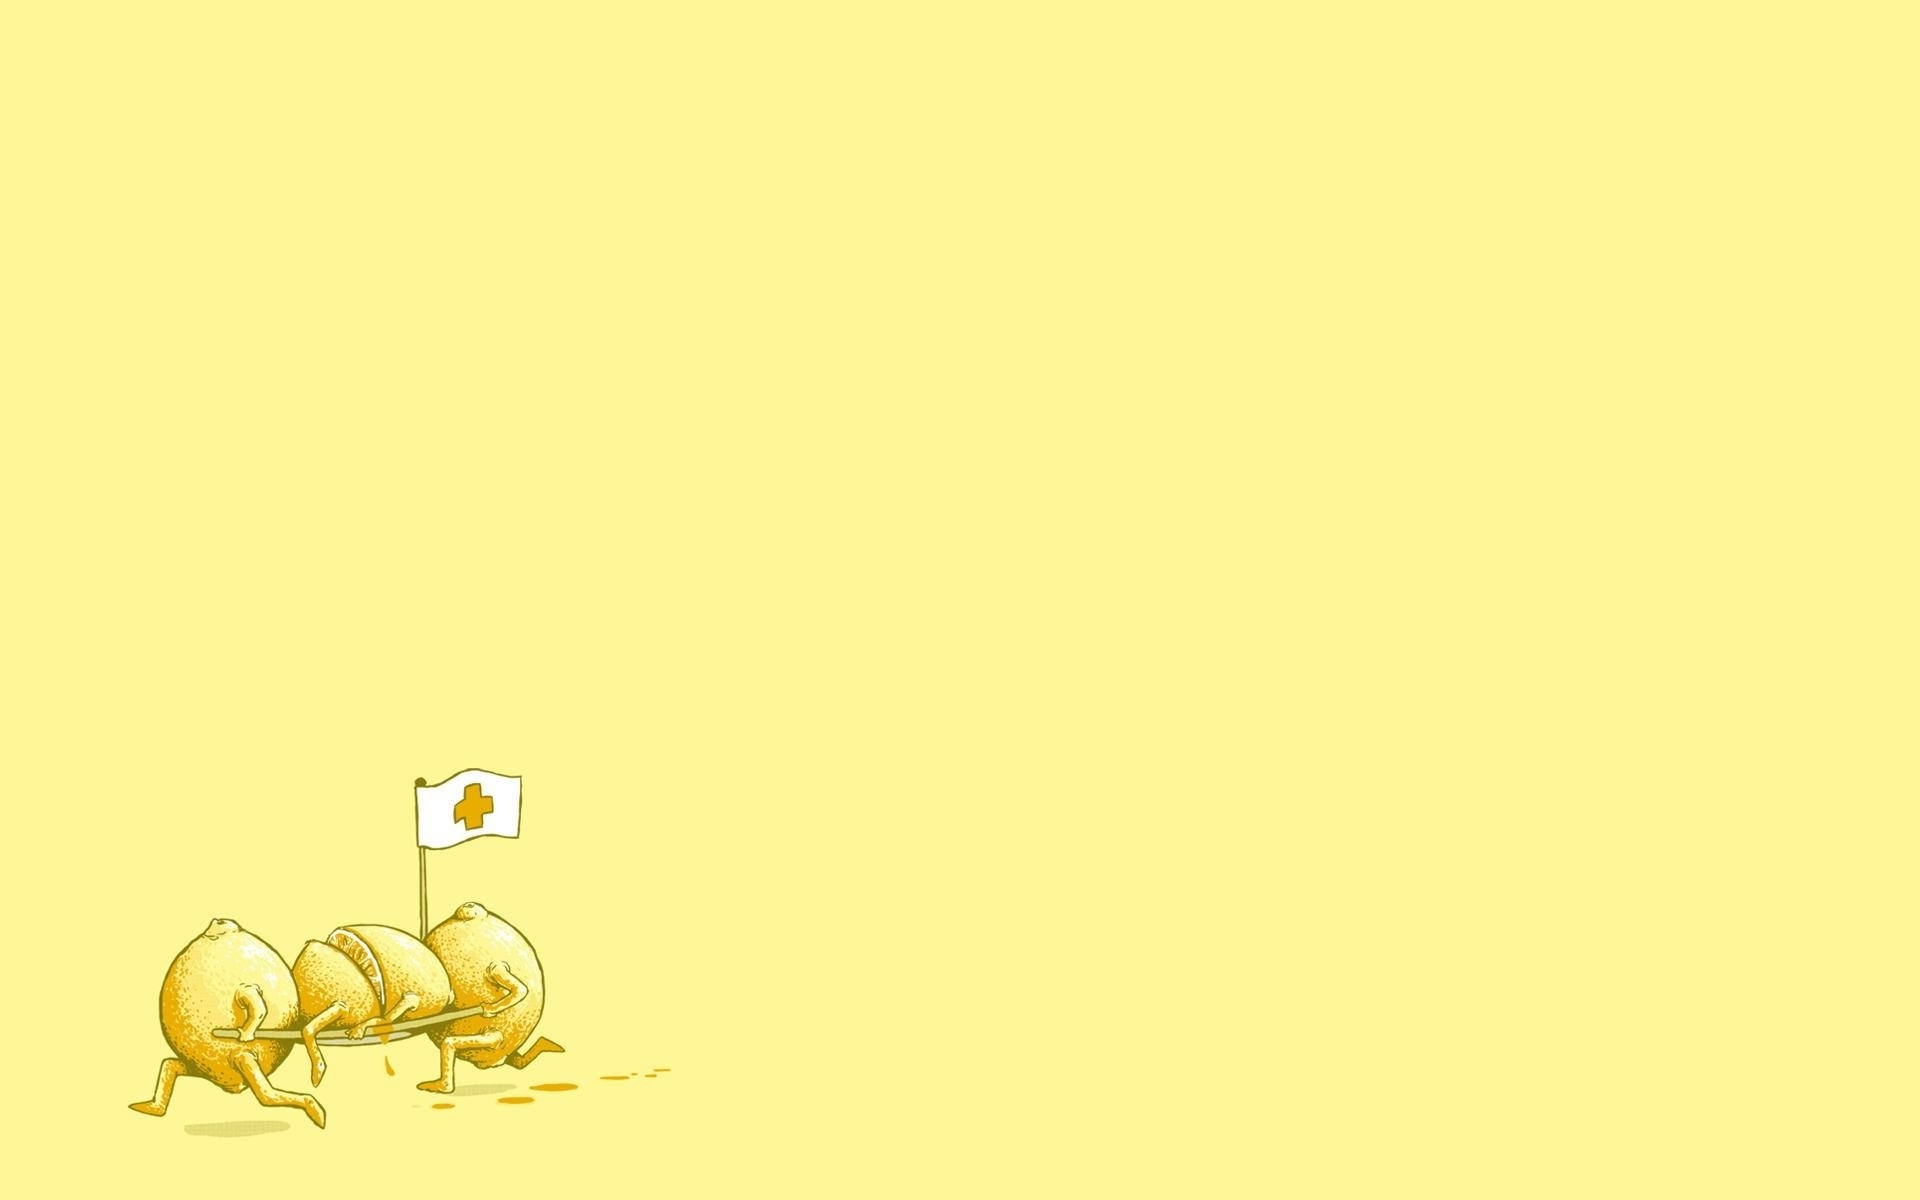 Cute Fruit Wallpapers Digital Art Minimalism Humor Yellow Background Fruit